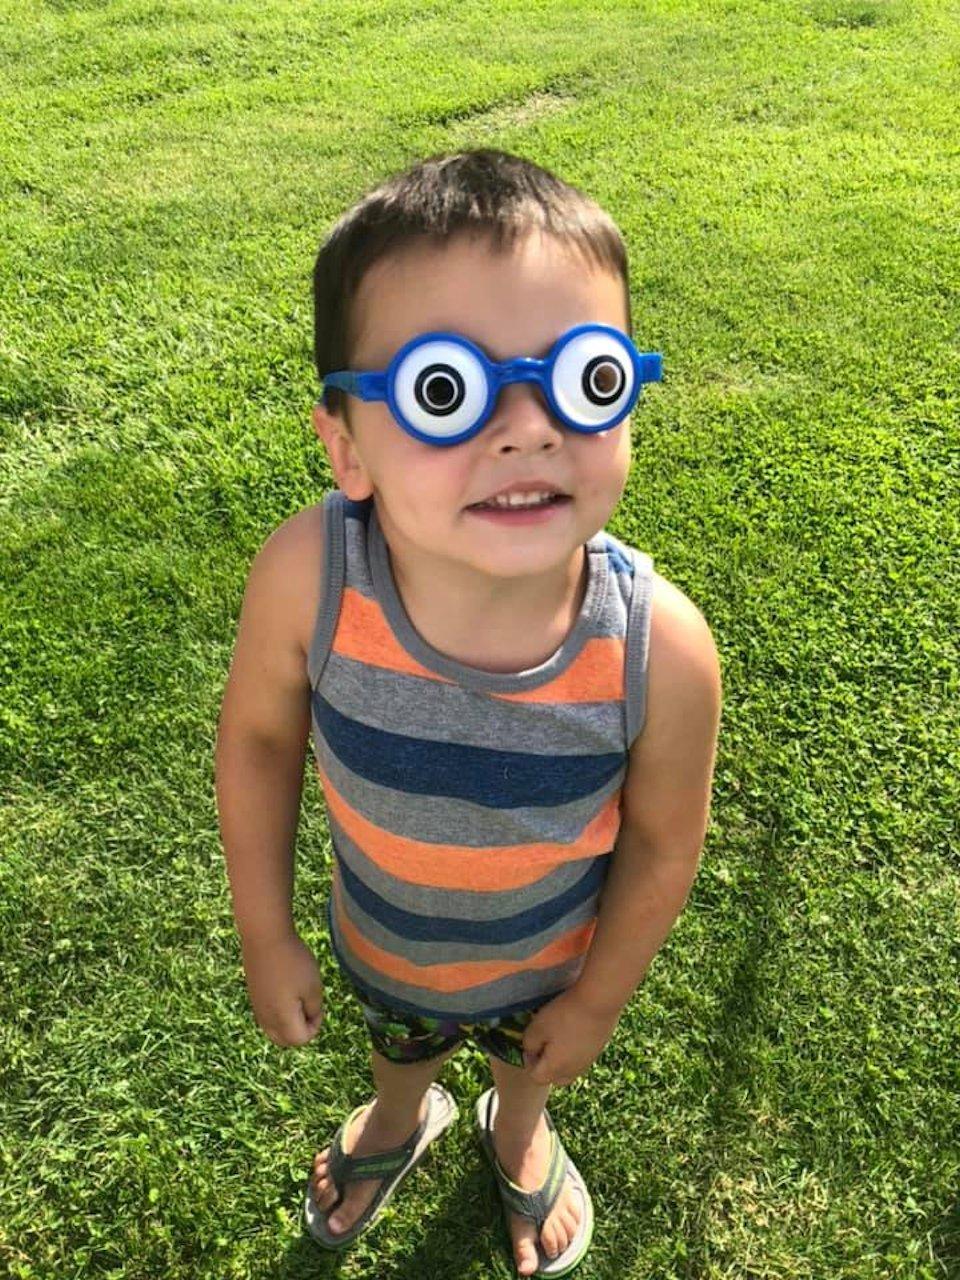 Boy with bug-eyed glasses